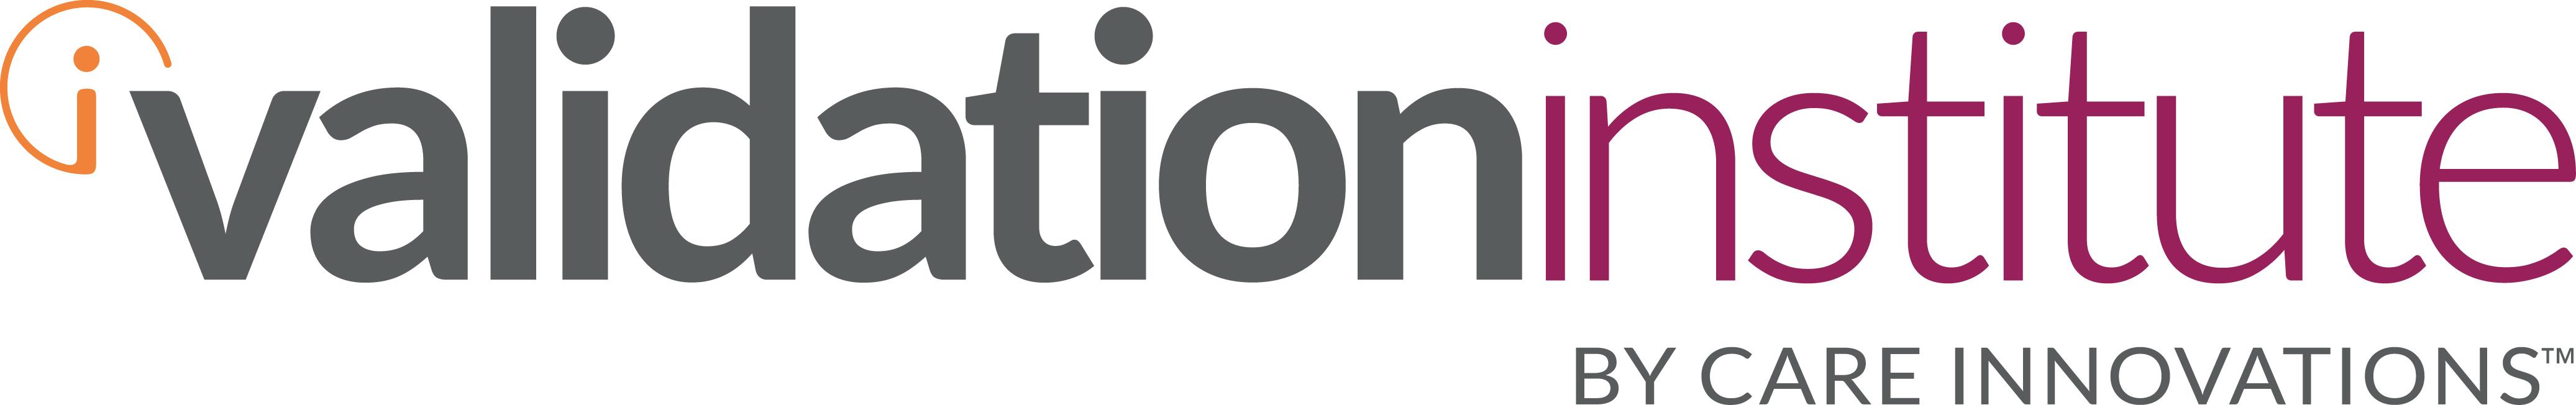 The Validation Institute Logo